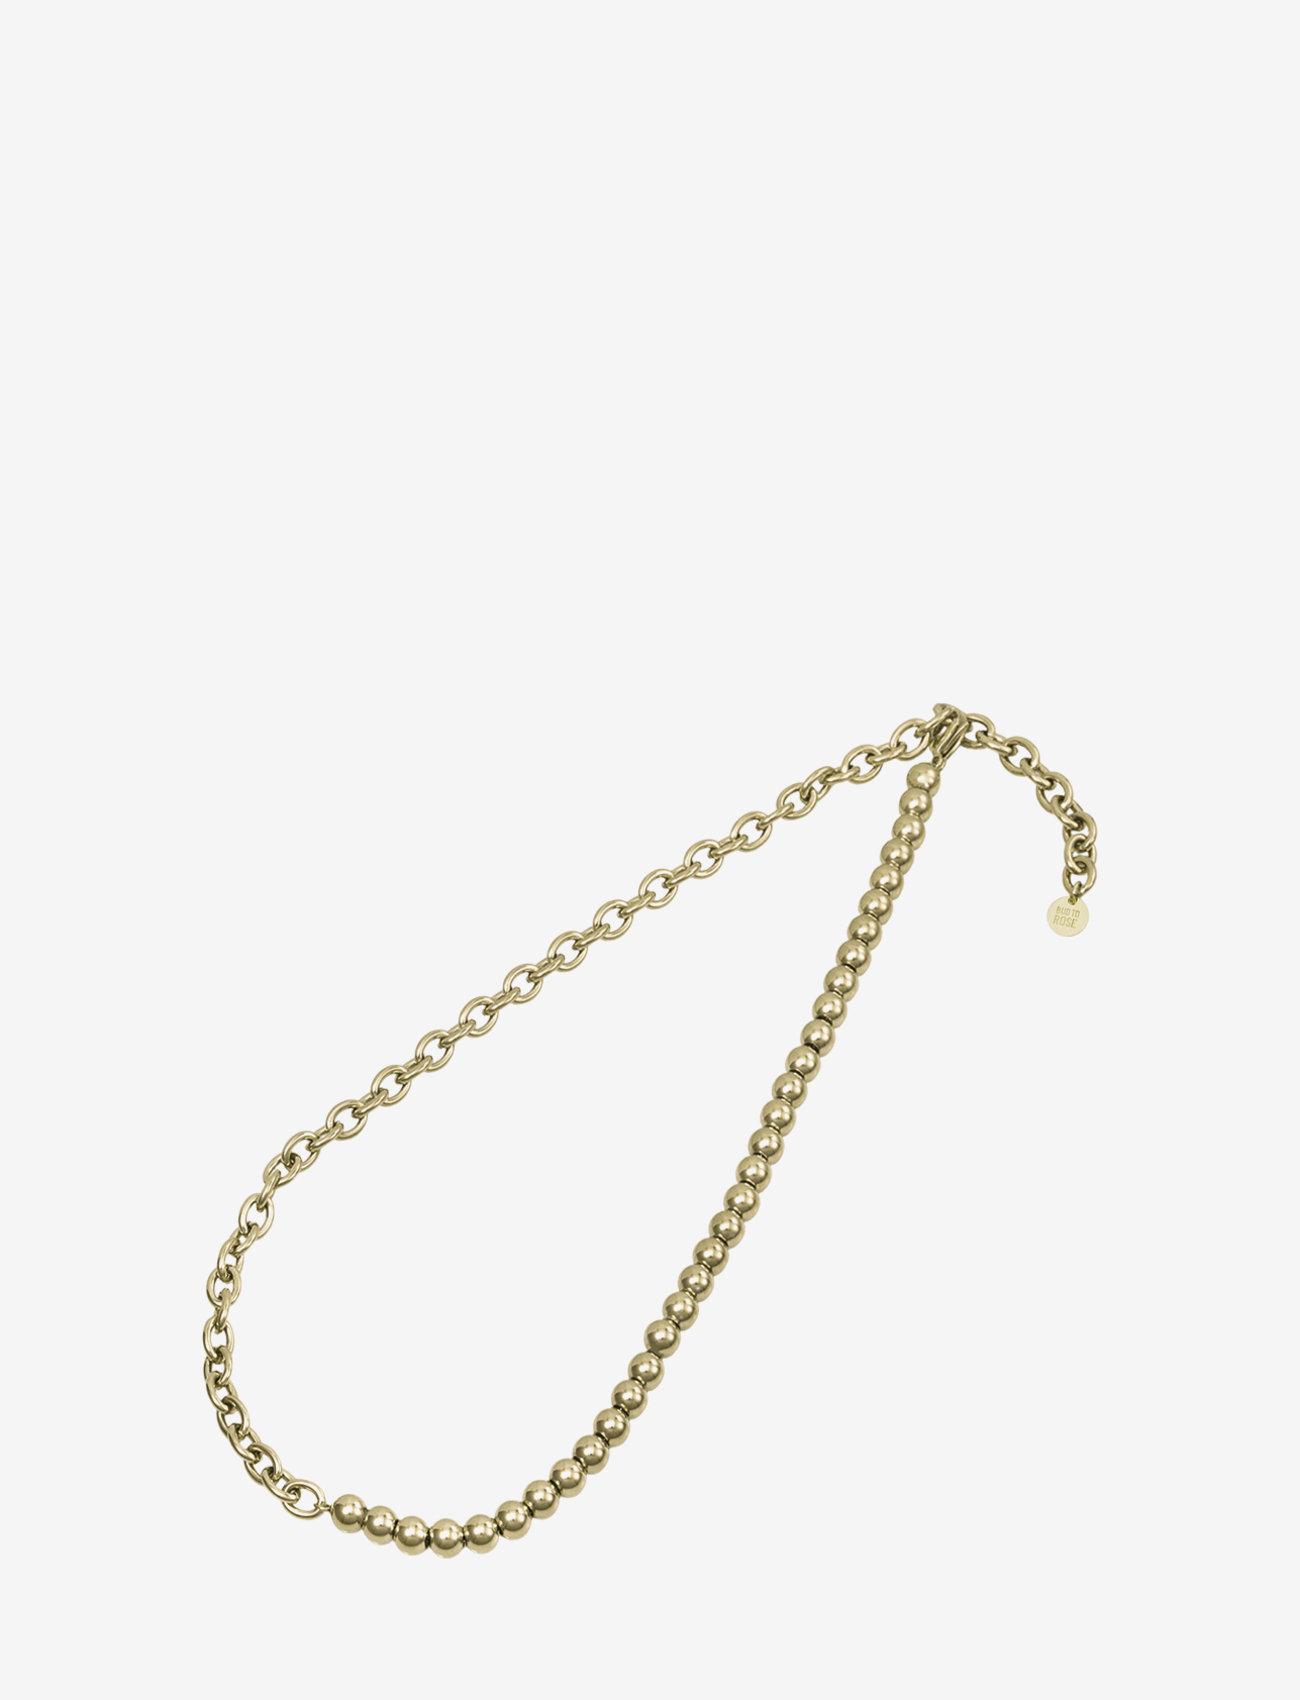 Bud to rose - Senso Short Necklace Gold - kettingen  - gold - 1